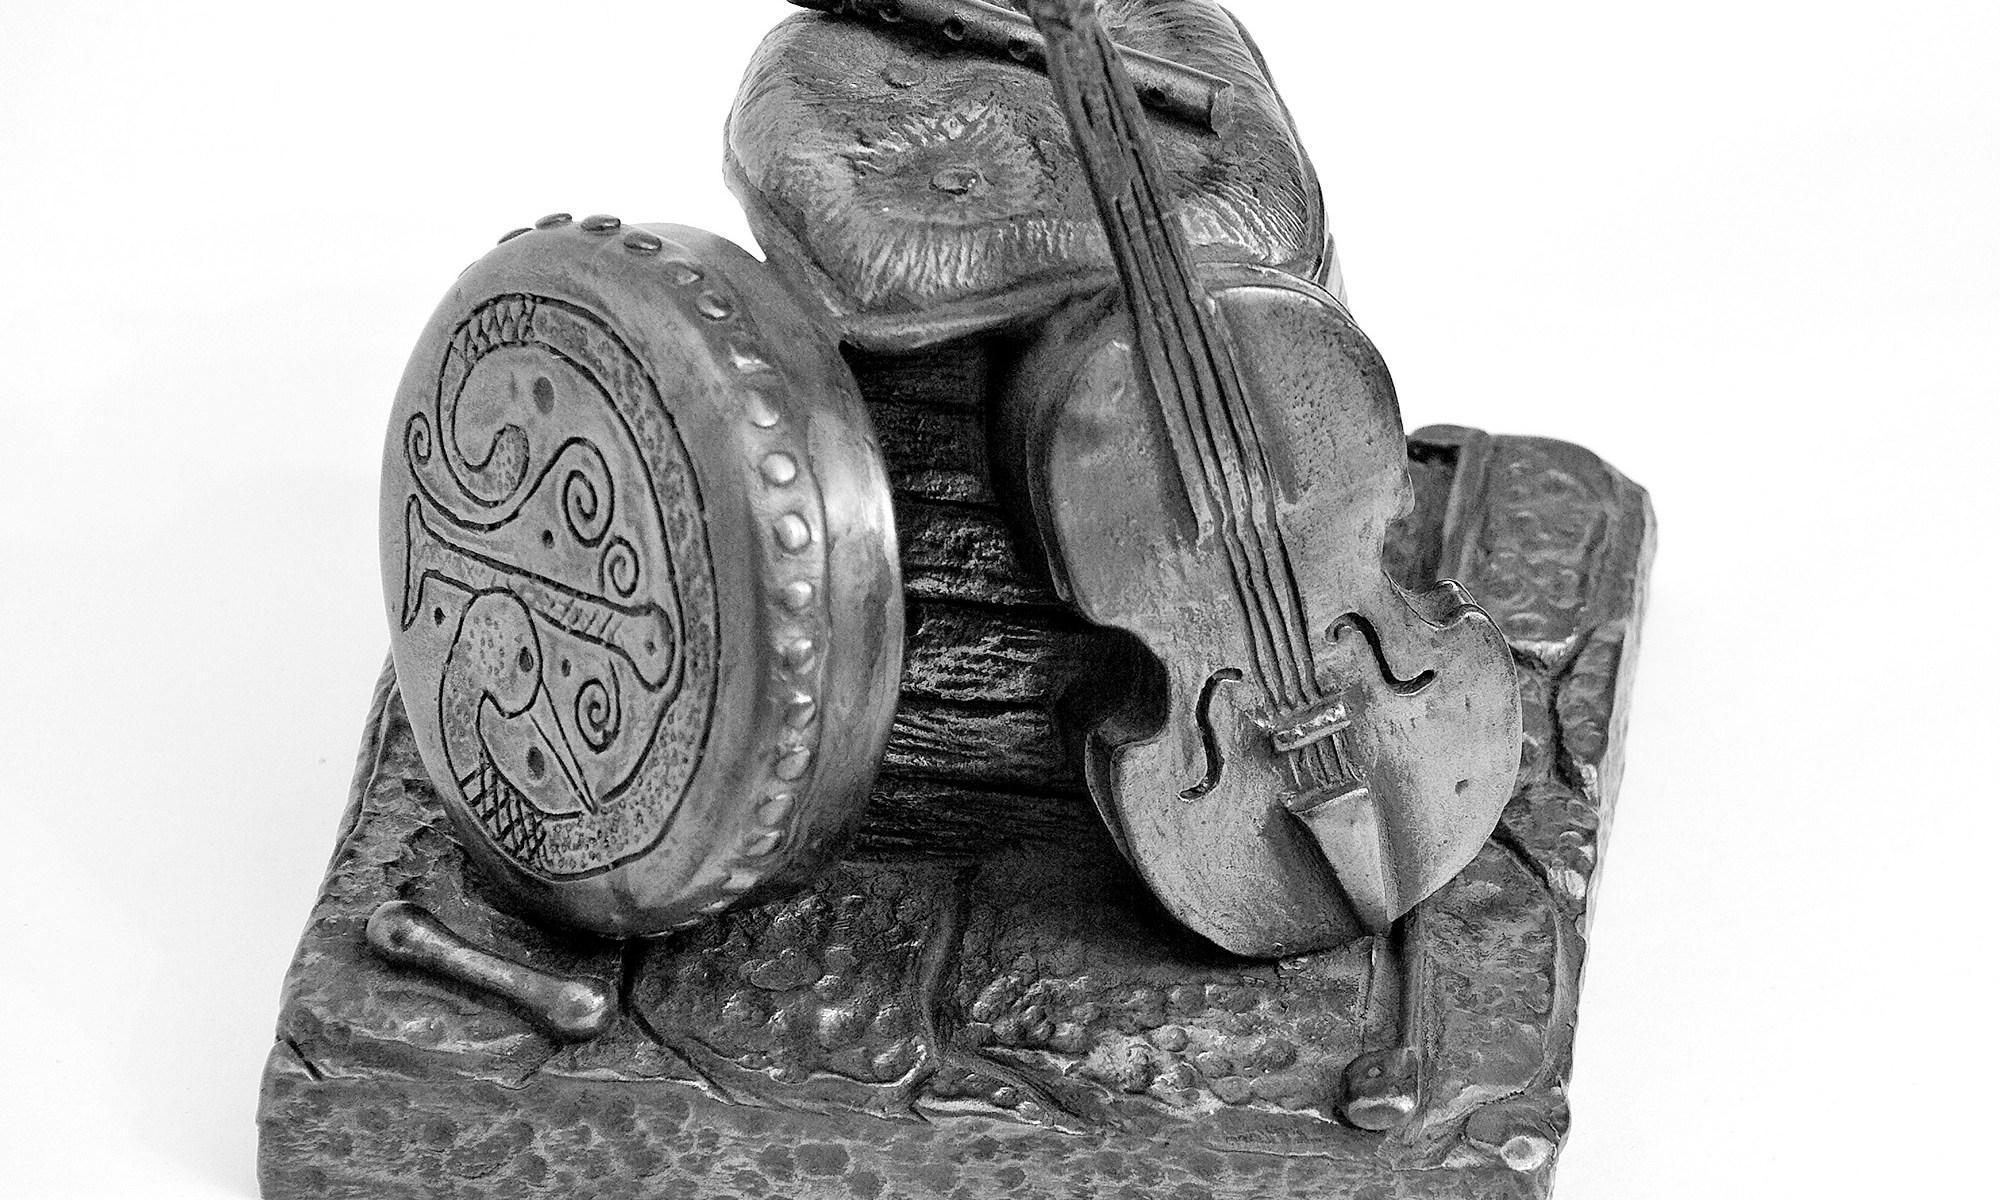 Study of Bronze Instruments Statue